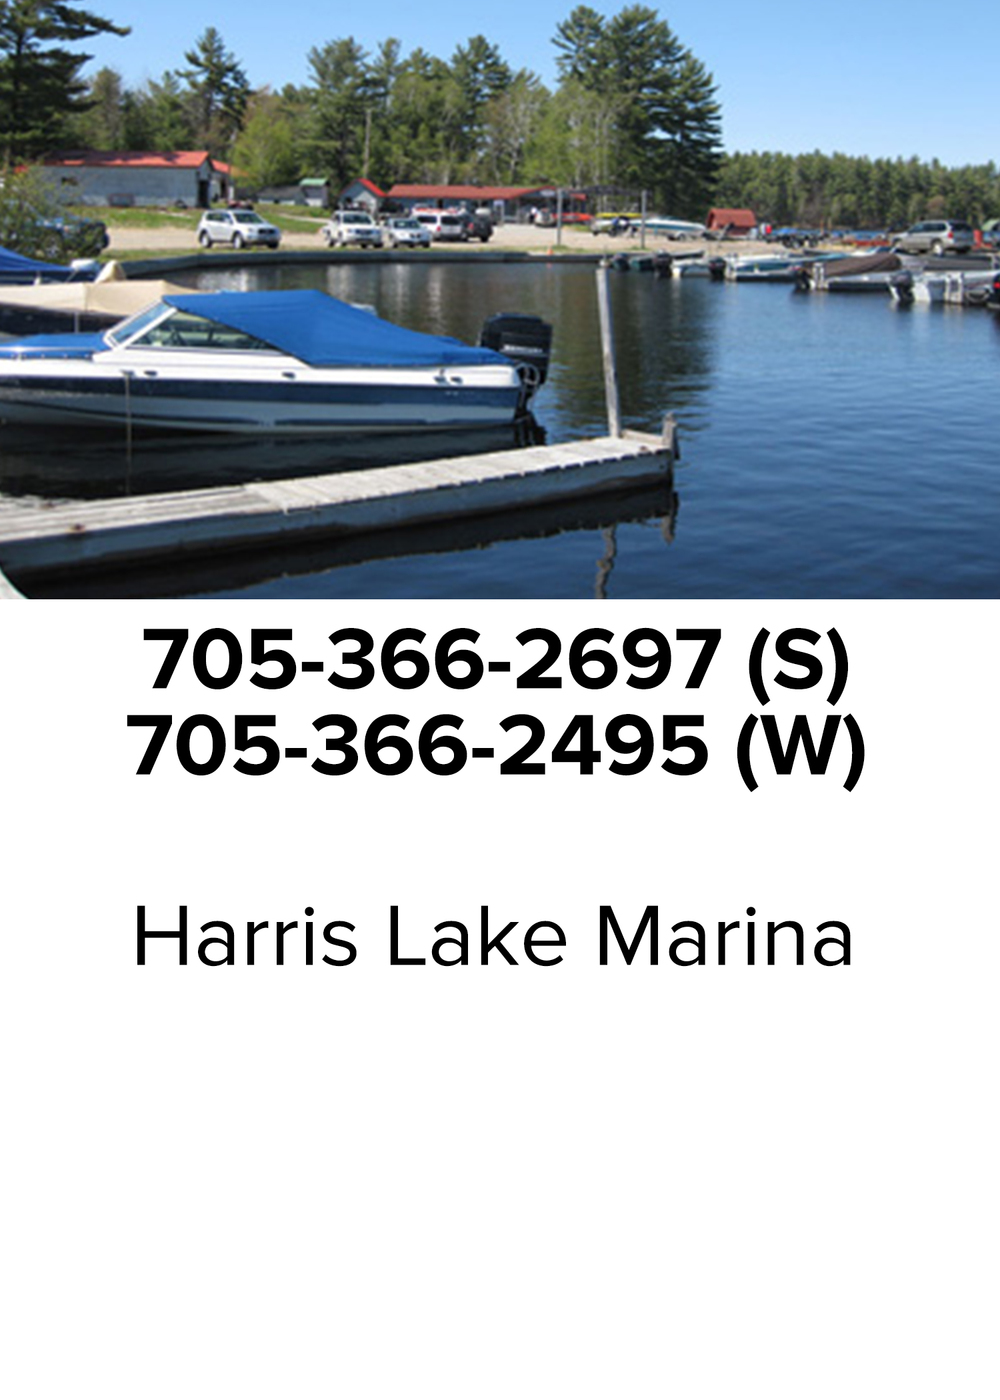 Harris Lake Marina